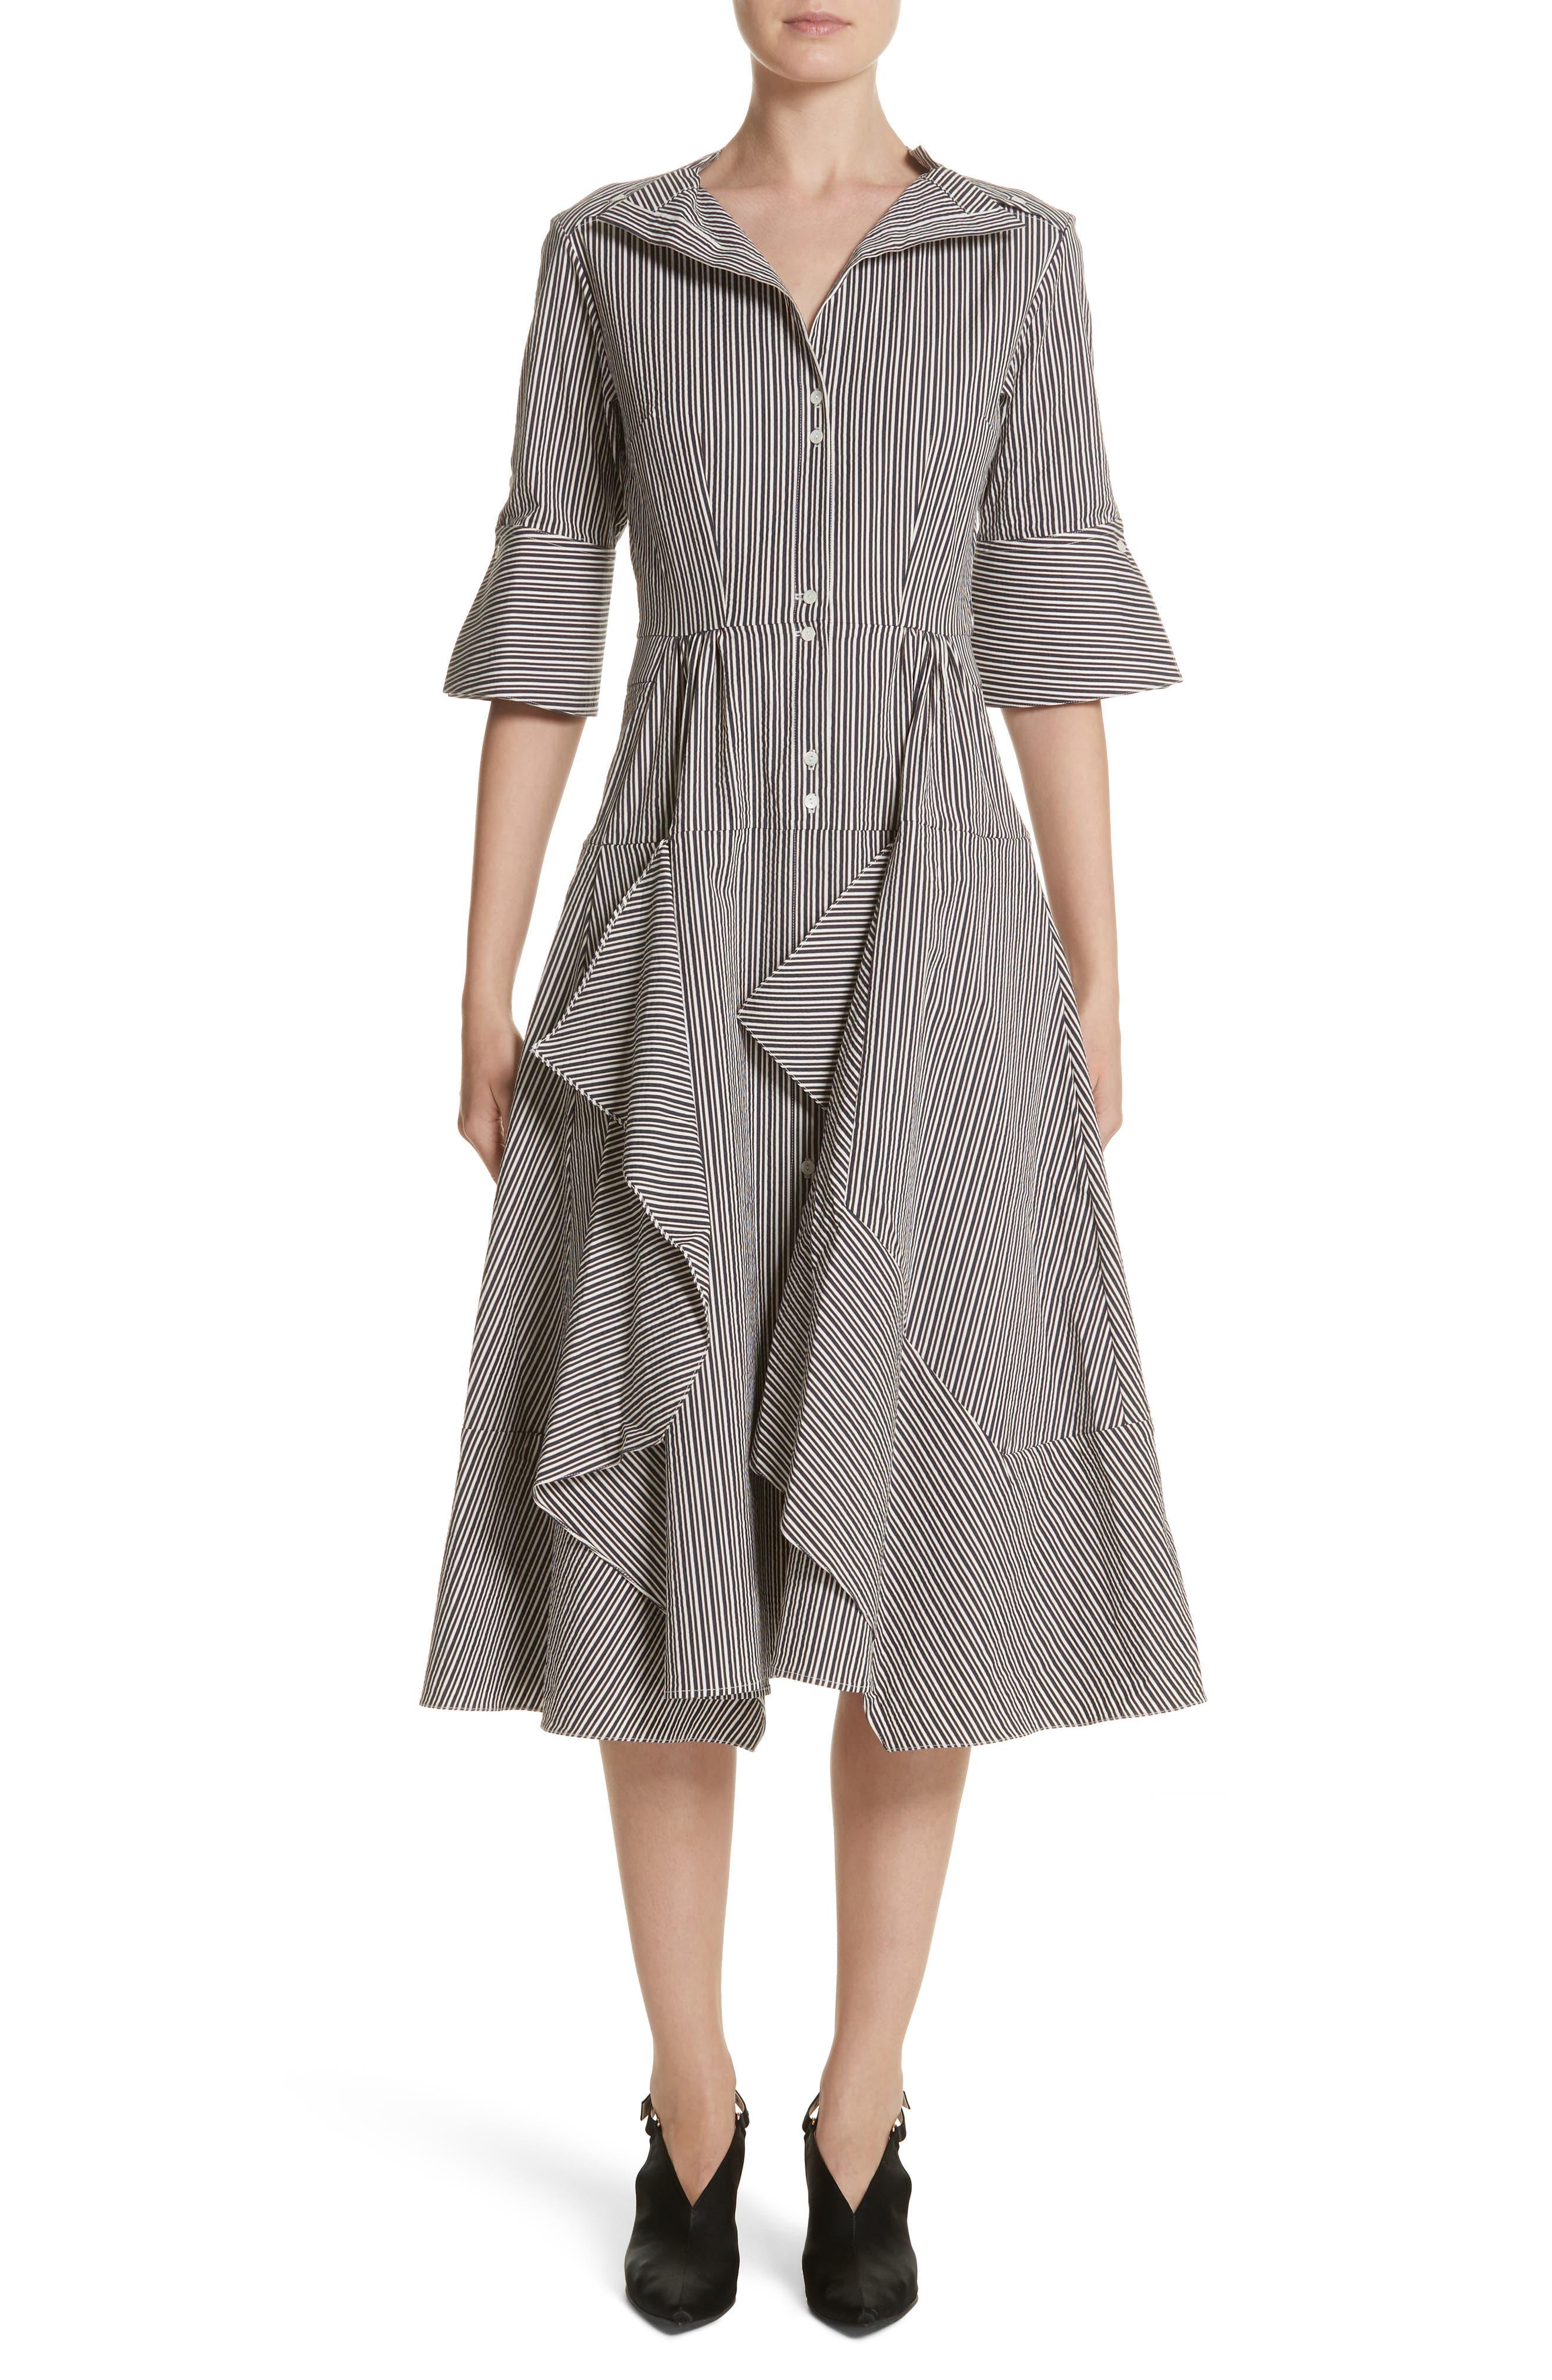 PALMER//HARDING April Stripe Shirtdress